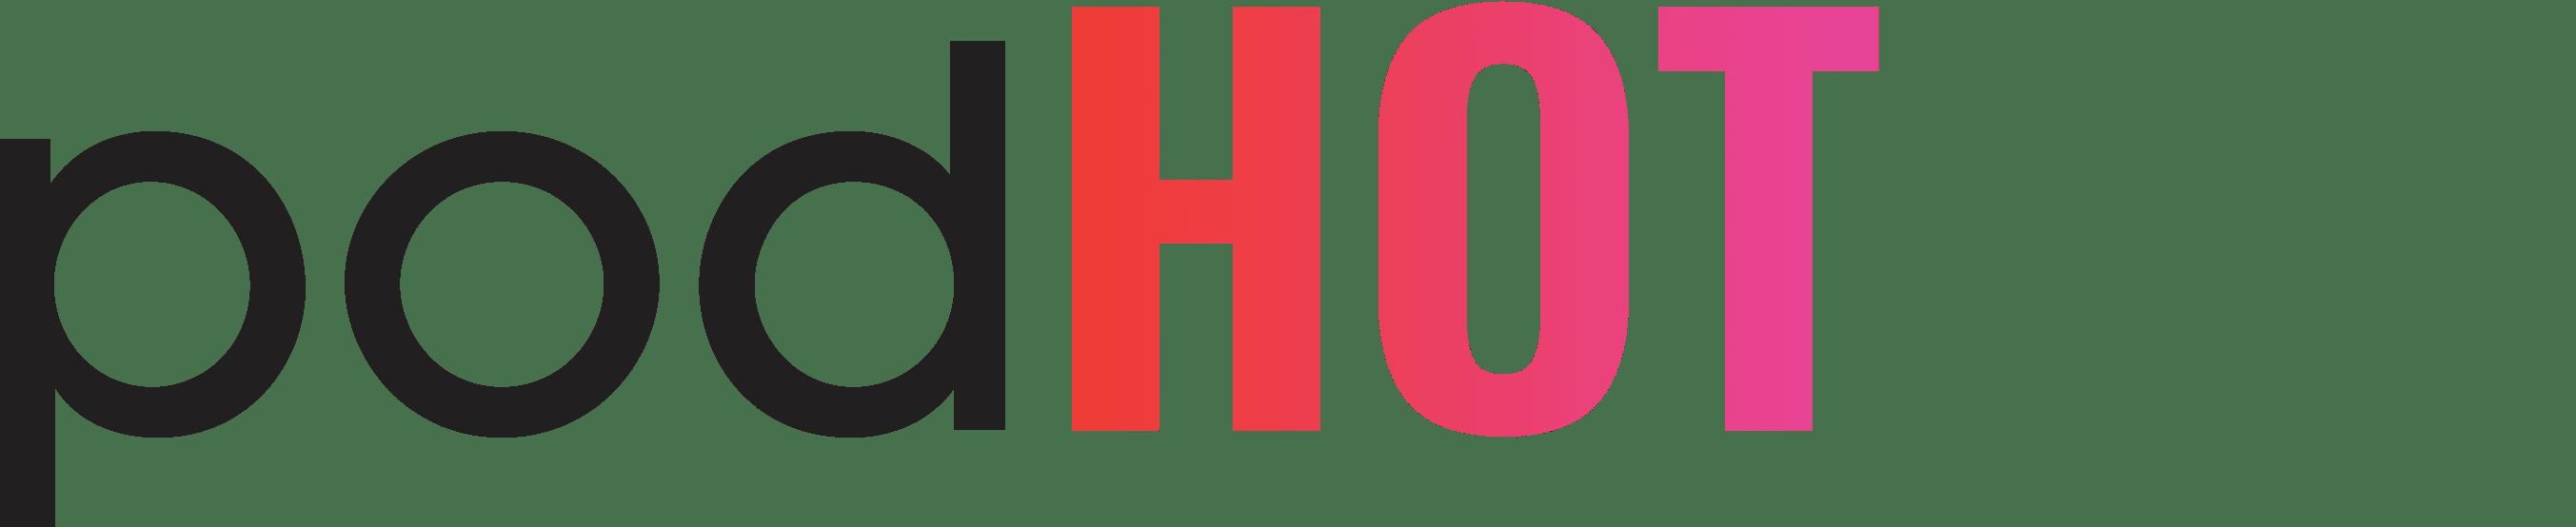 pod-logos-hot